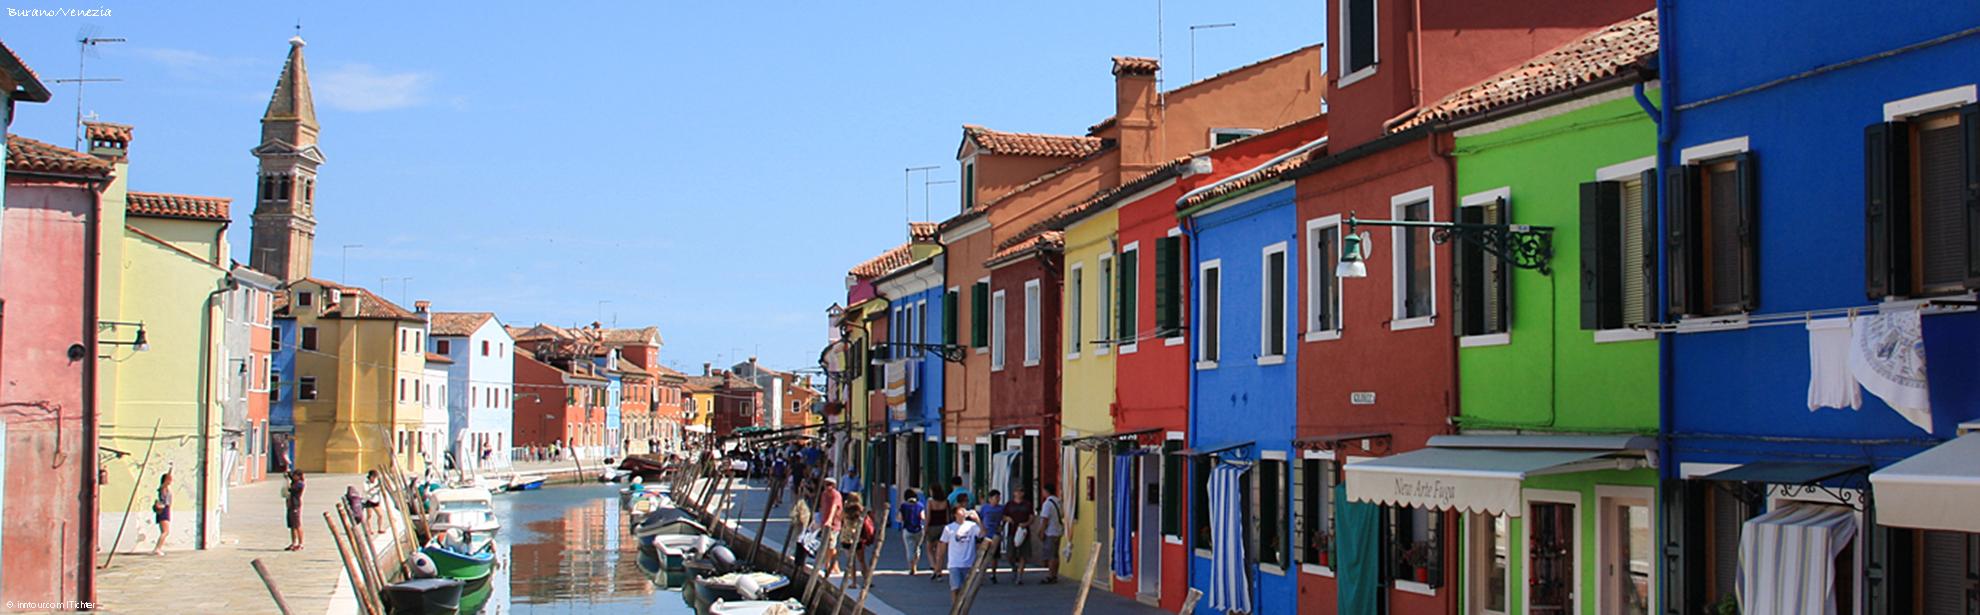 Osportinntour_Tichter_Burano-Venezia_IMG_3560